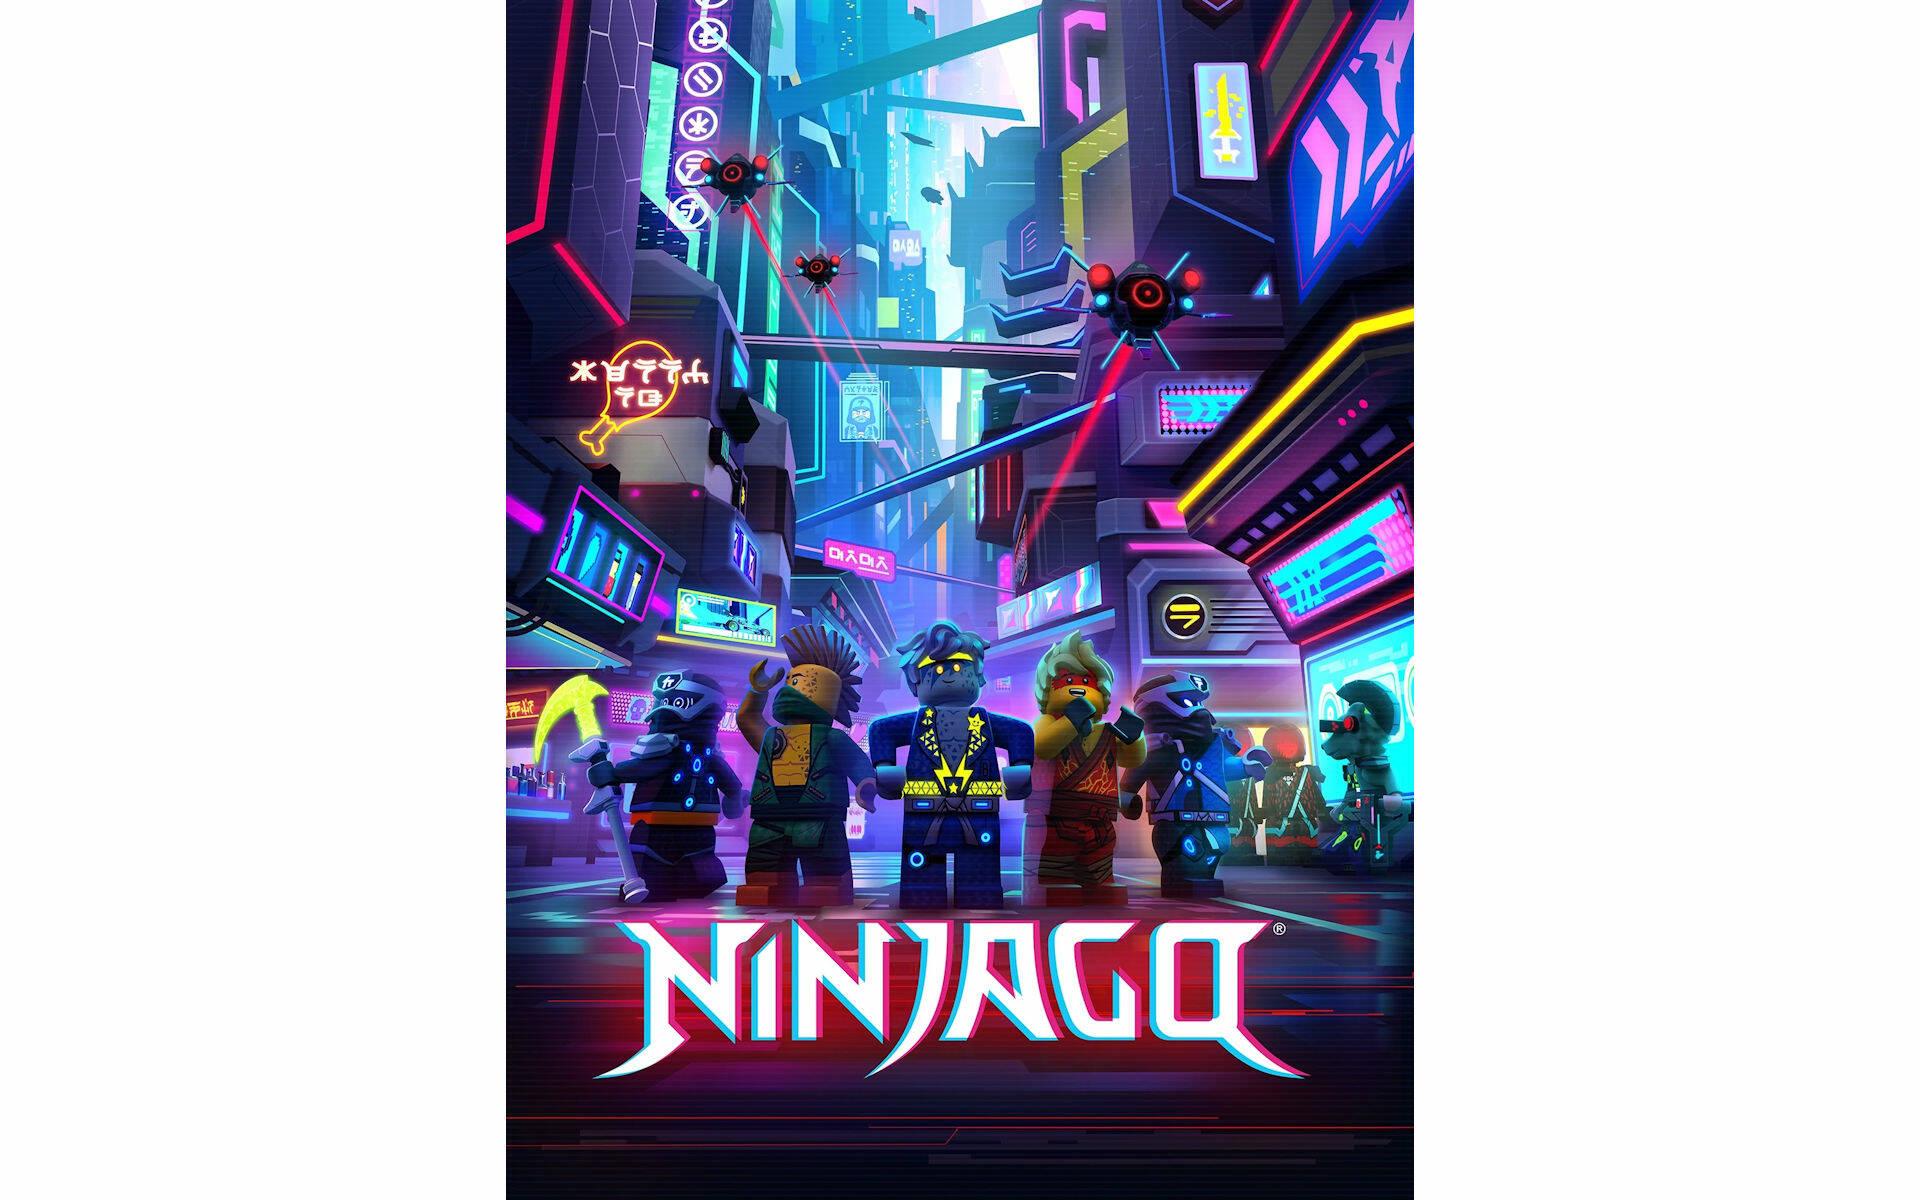 LEGO HYPE NINJAGO